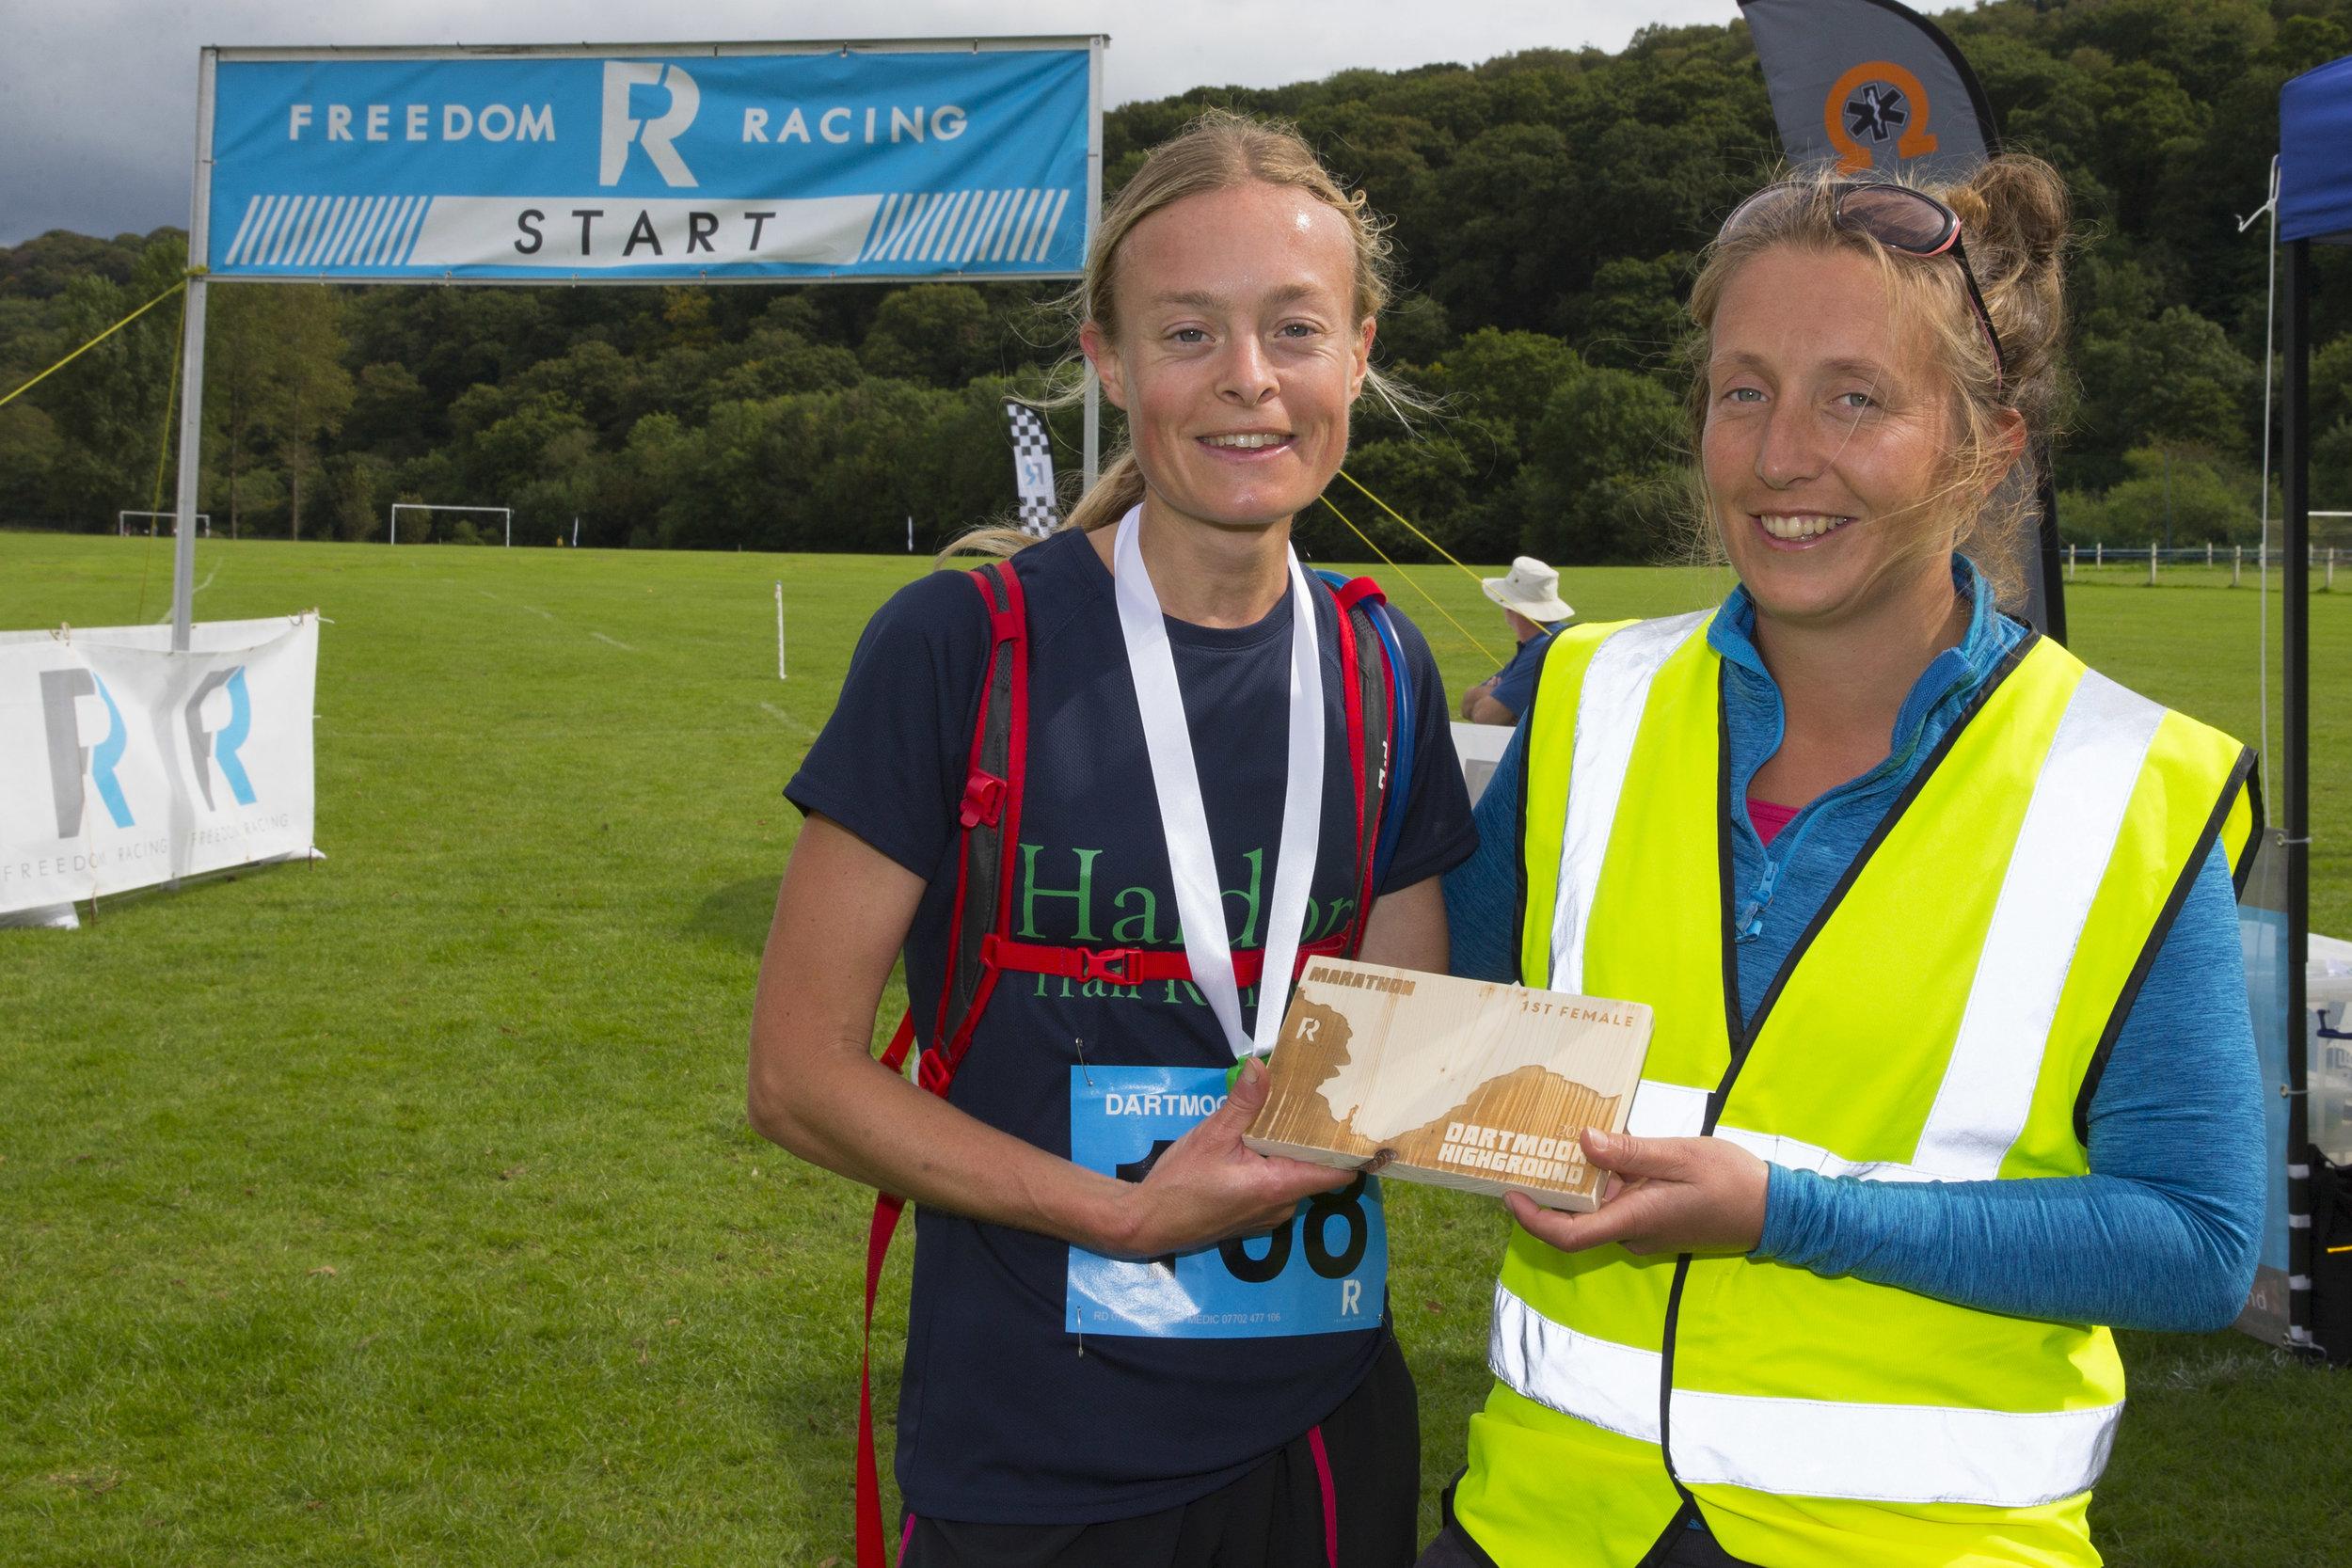 Dartmoor Marathon running race finish